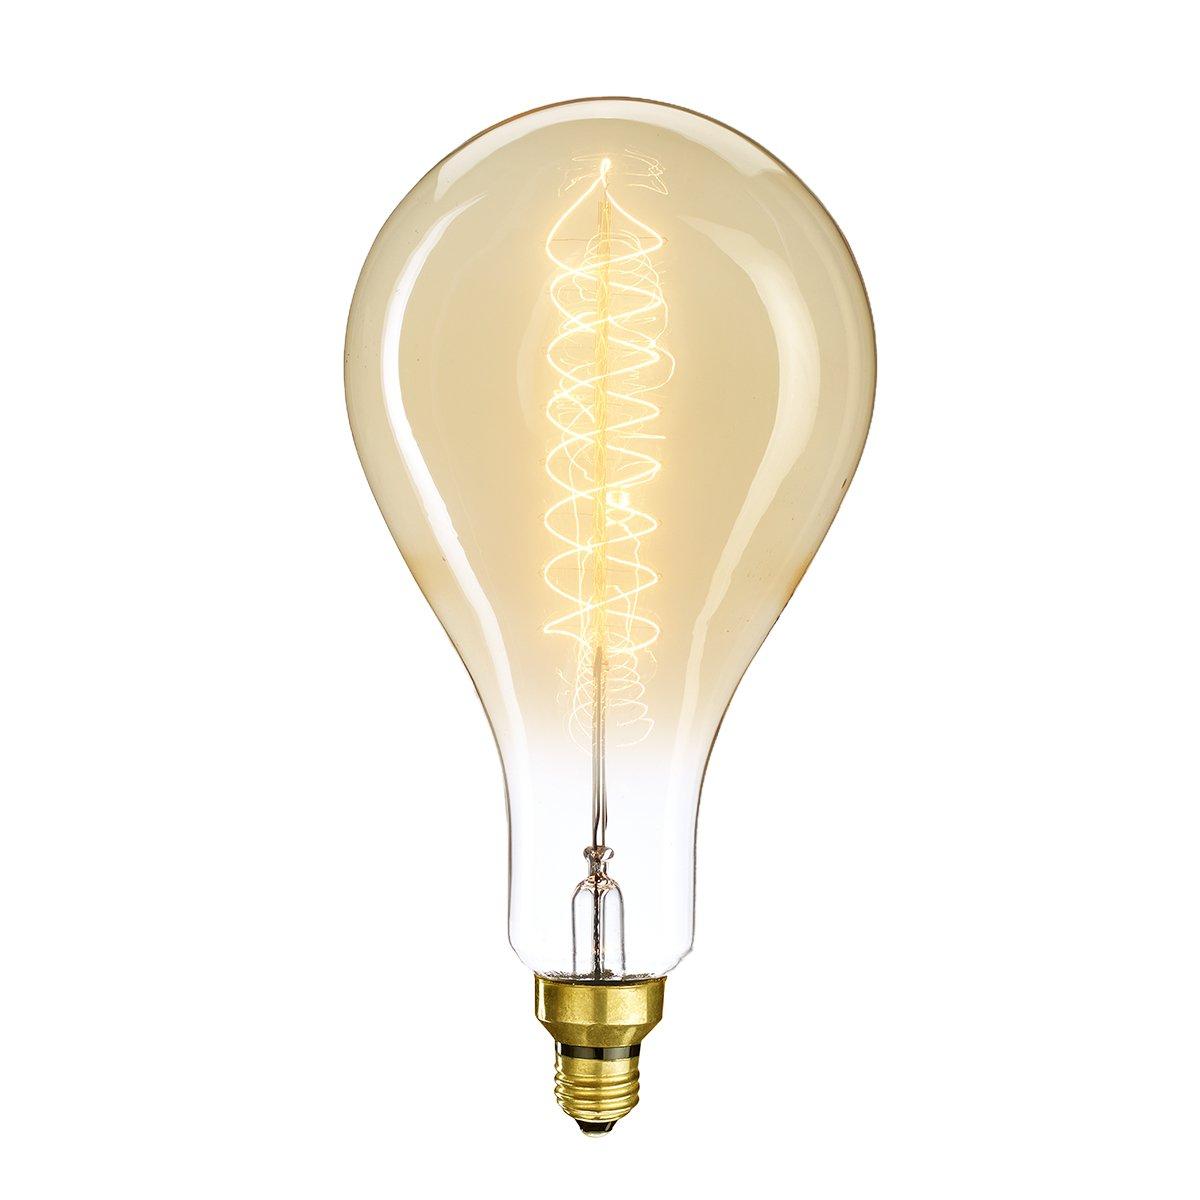 Bulbrite NOS60-PS 137101 60W Incandescent Grand Nostalgic Spiral Filament Bulb with Medium E26 Base, Antique Finish